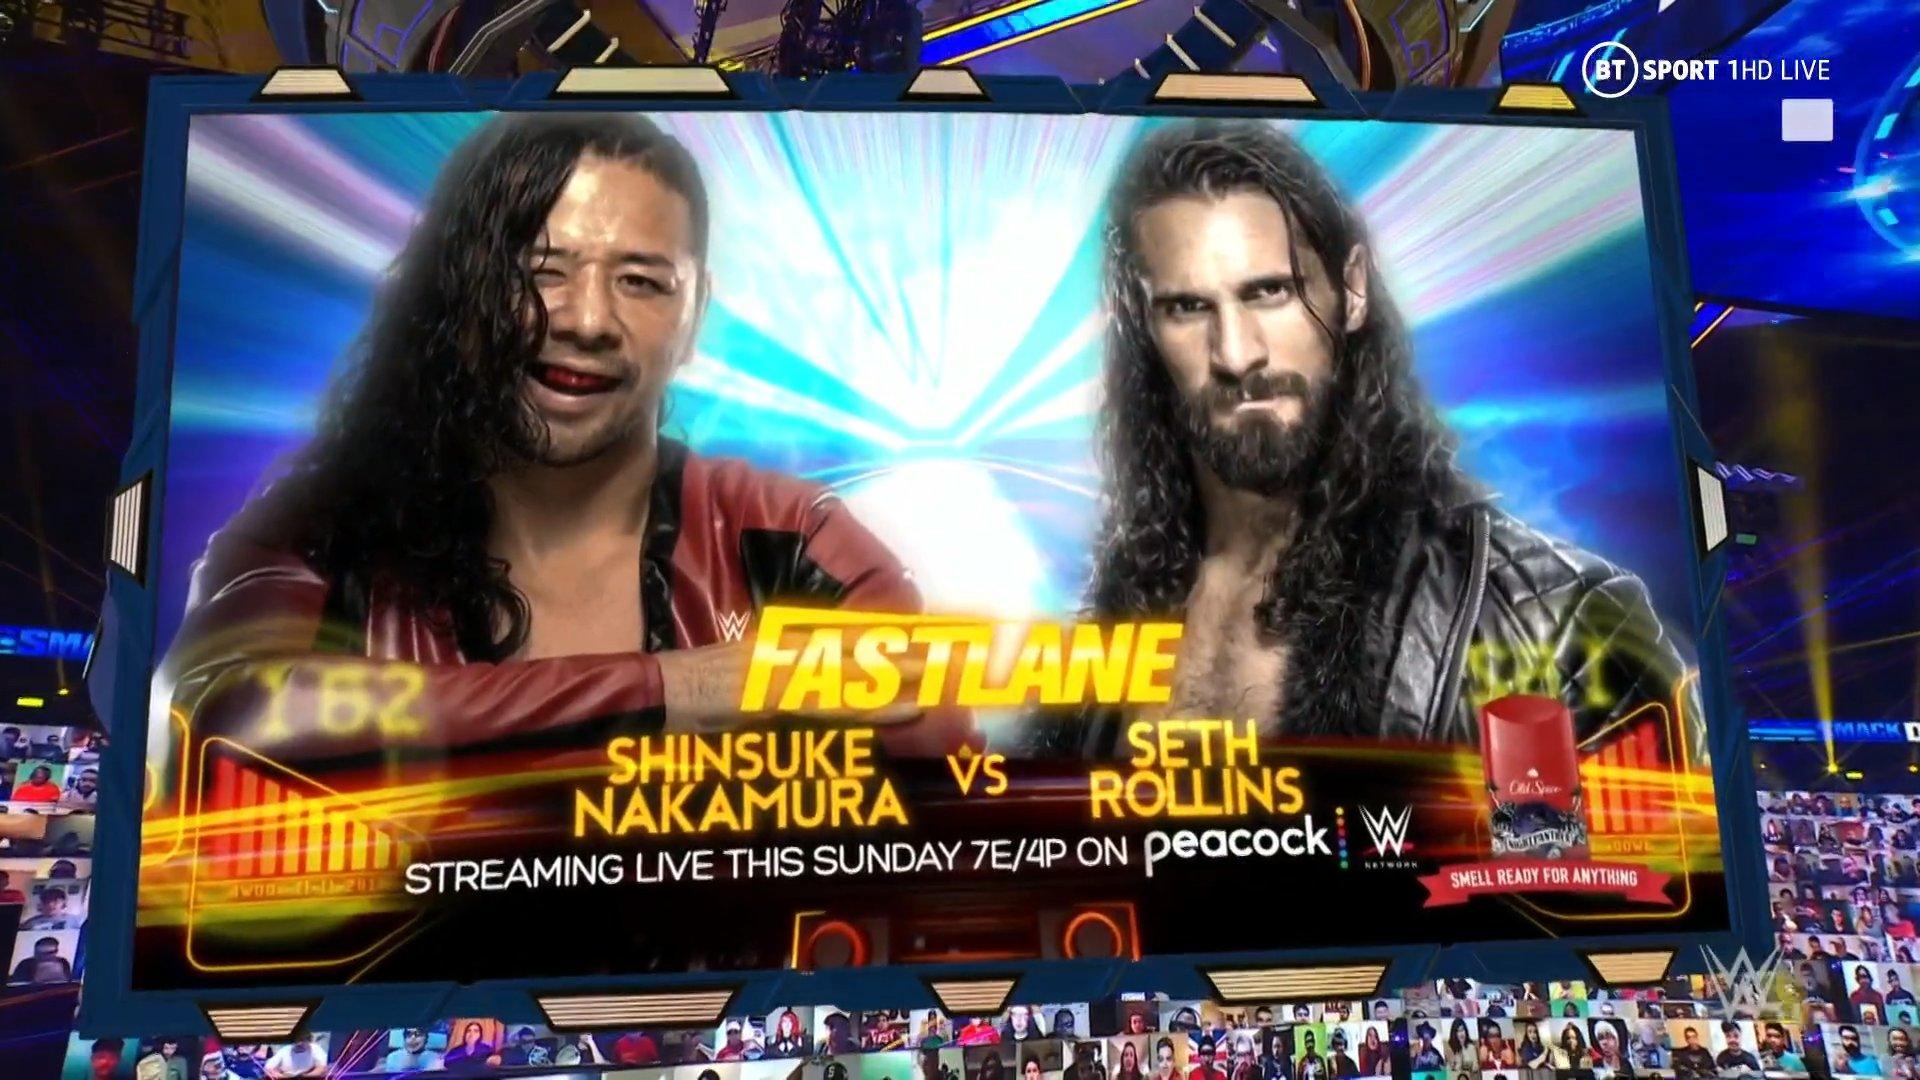 WWE Fastlane 2021: Full Match Card Set Following Smackdown 87